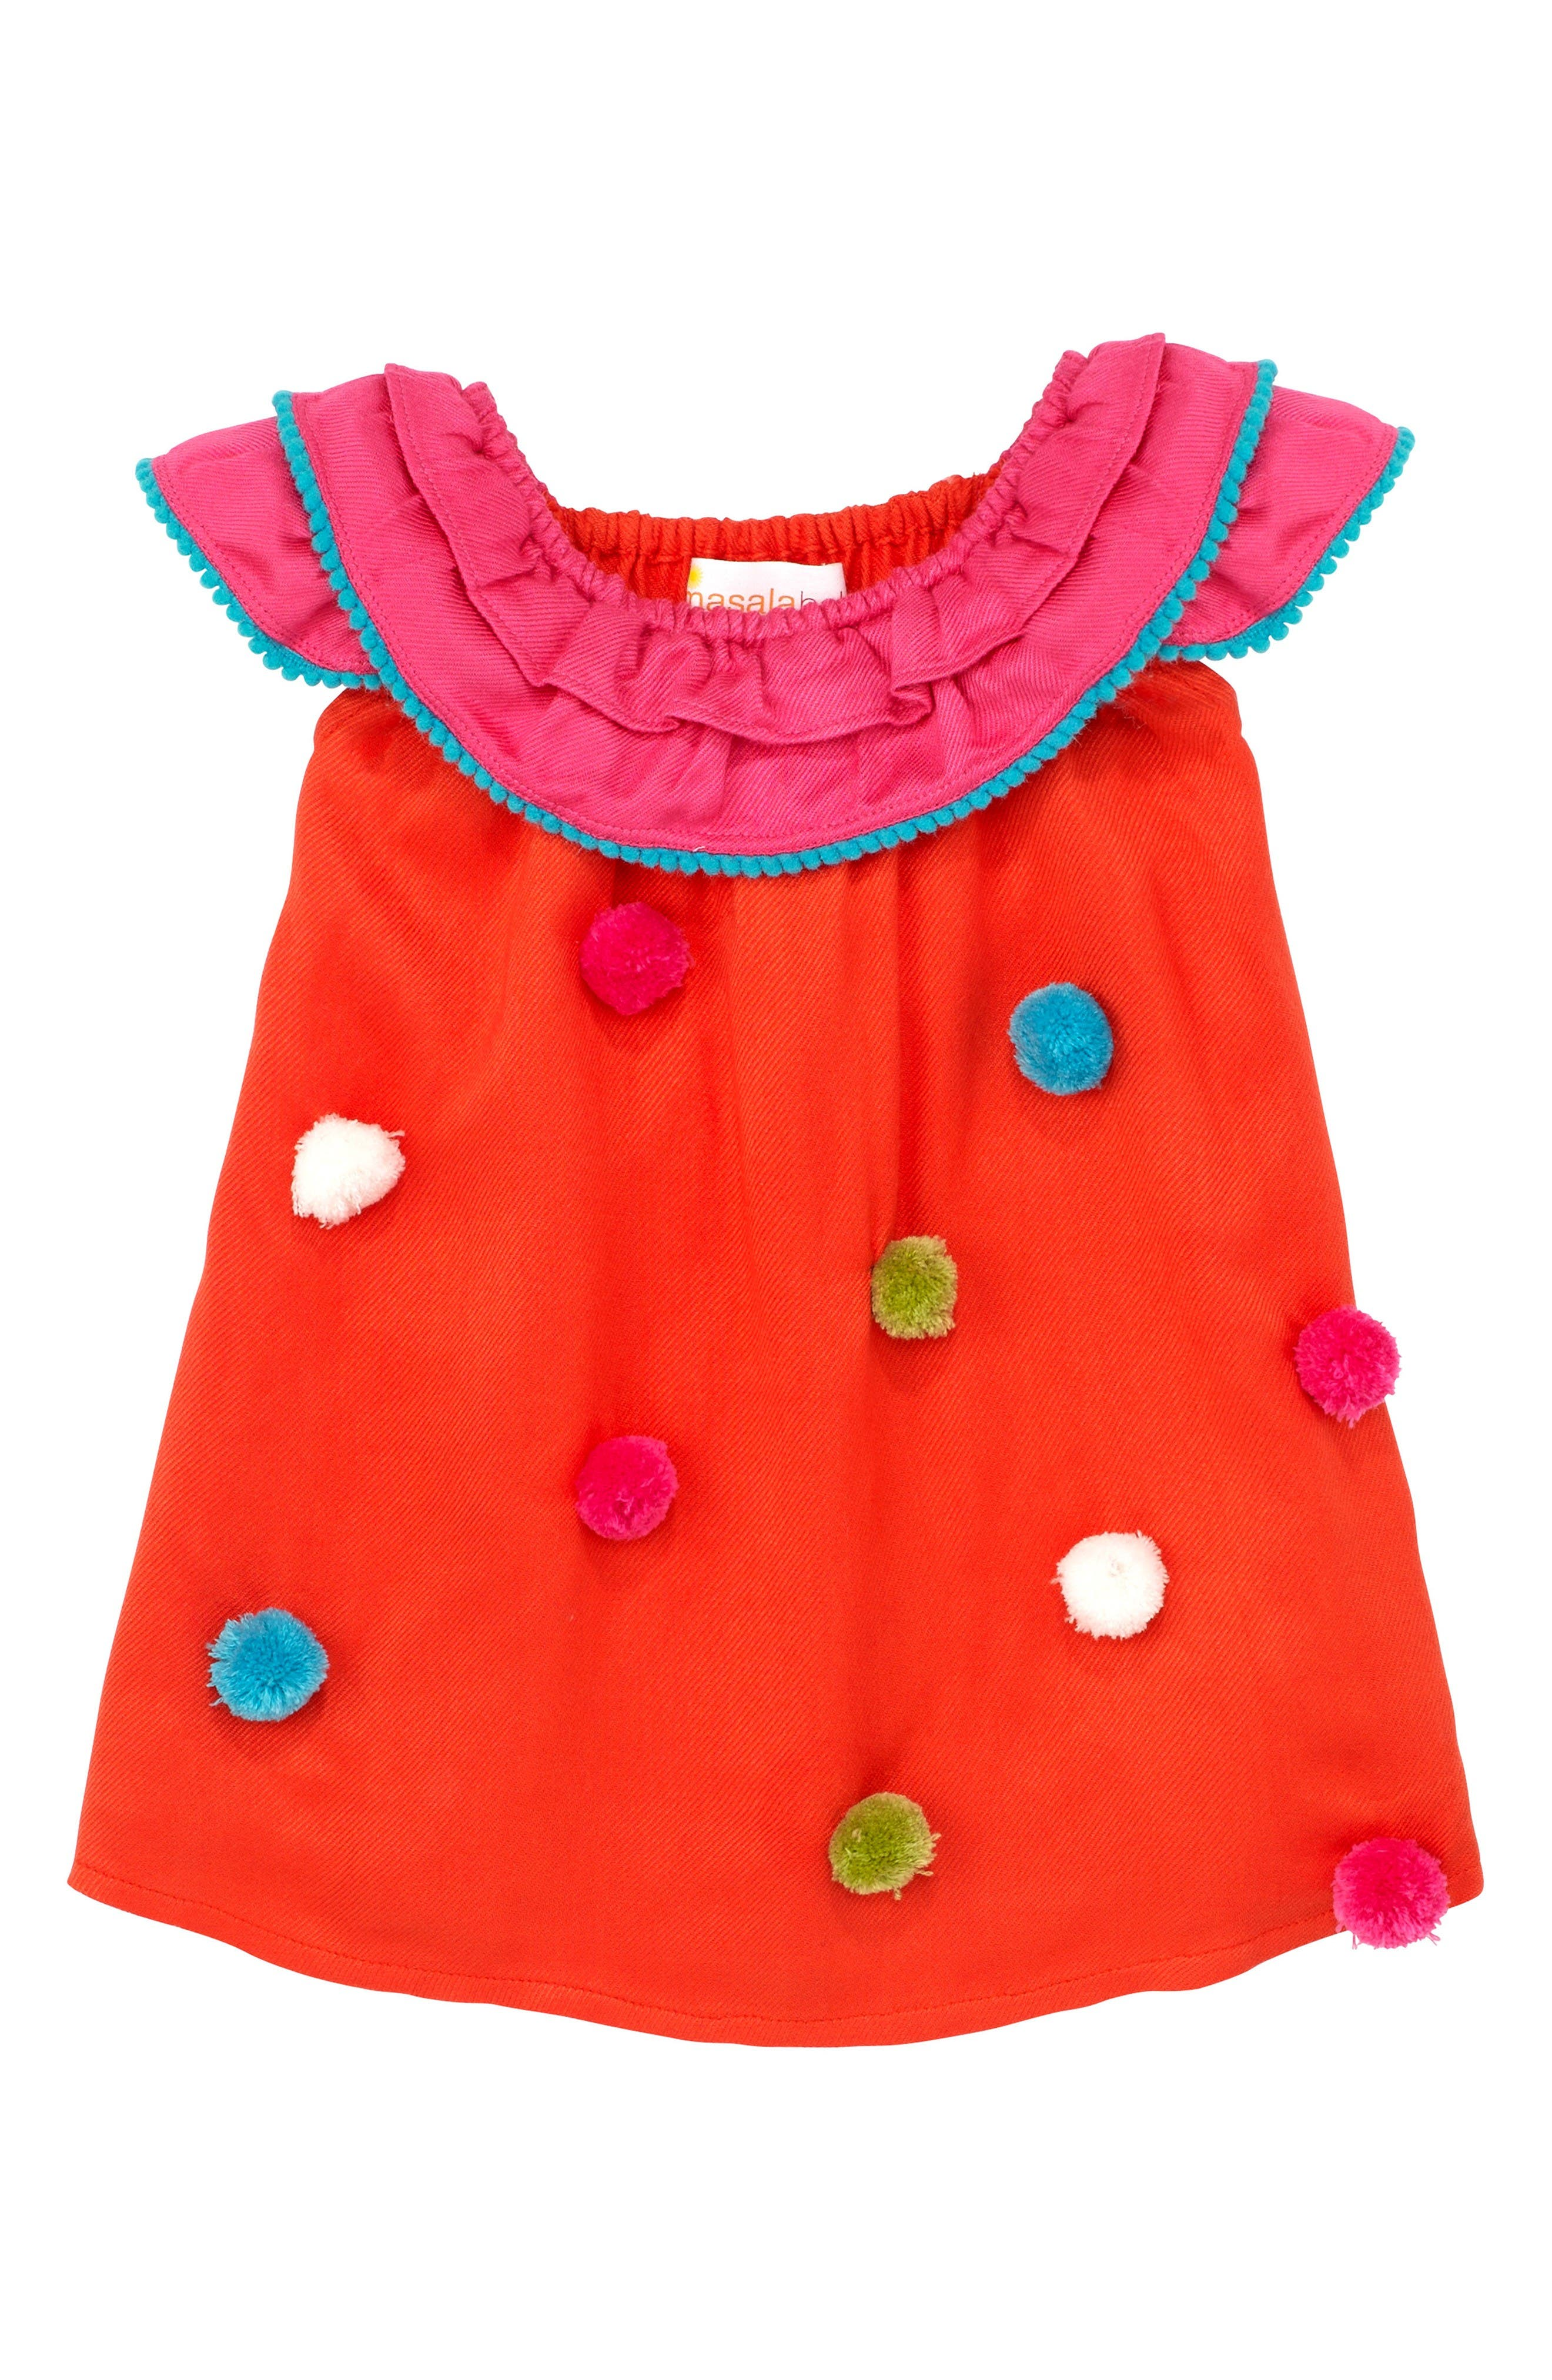 Masalababy Pompom Dress (Baby Girls)